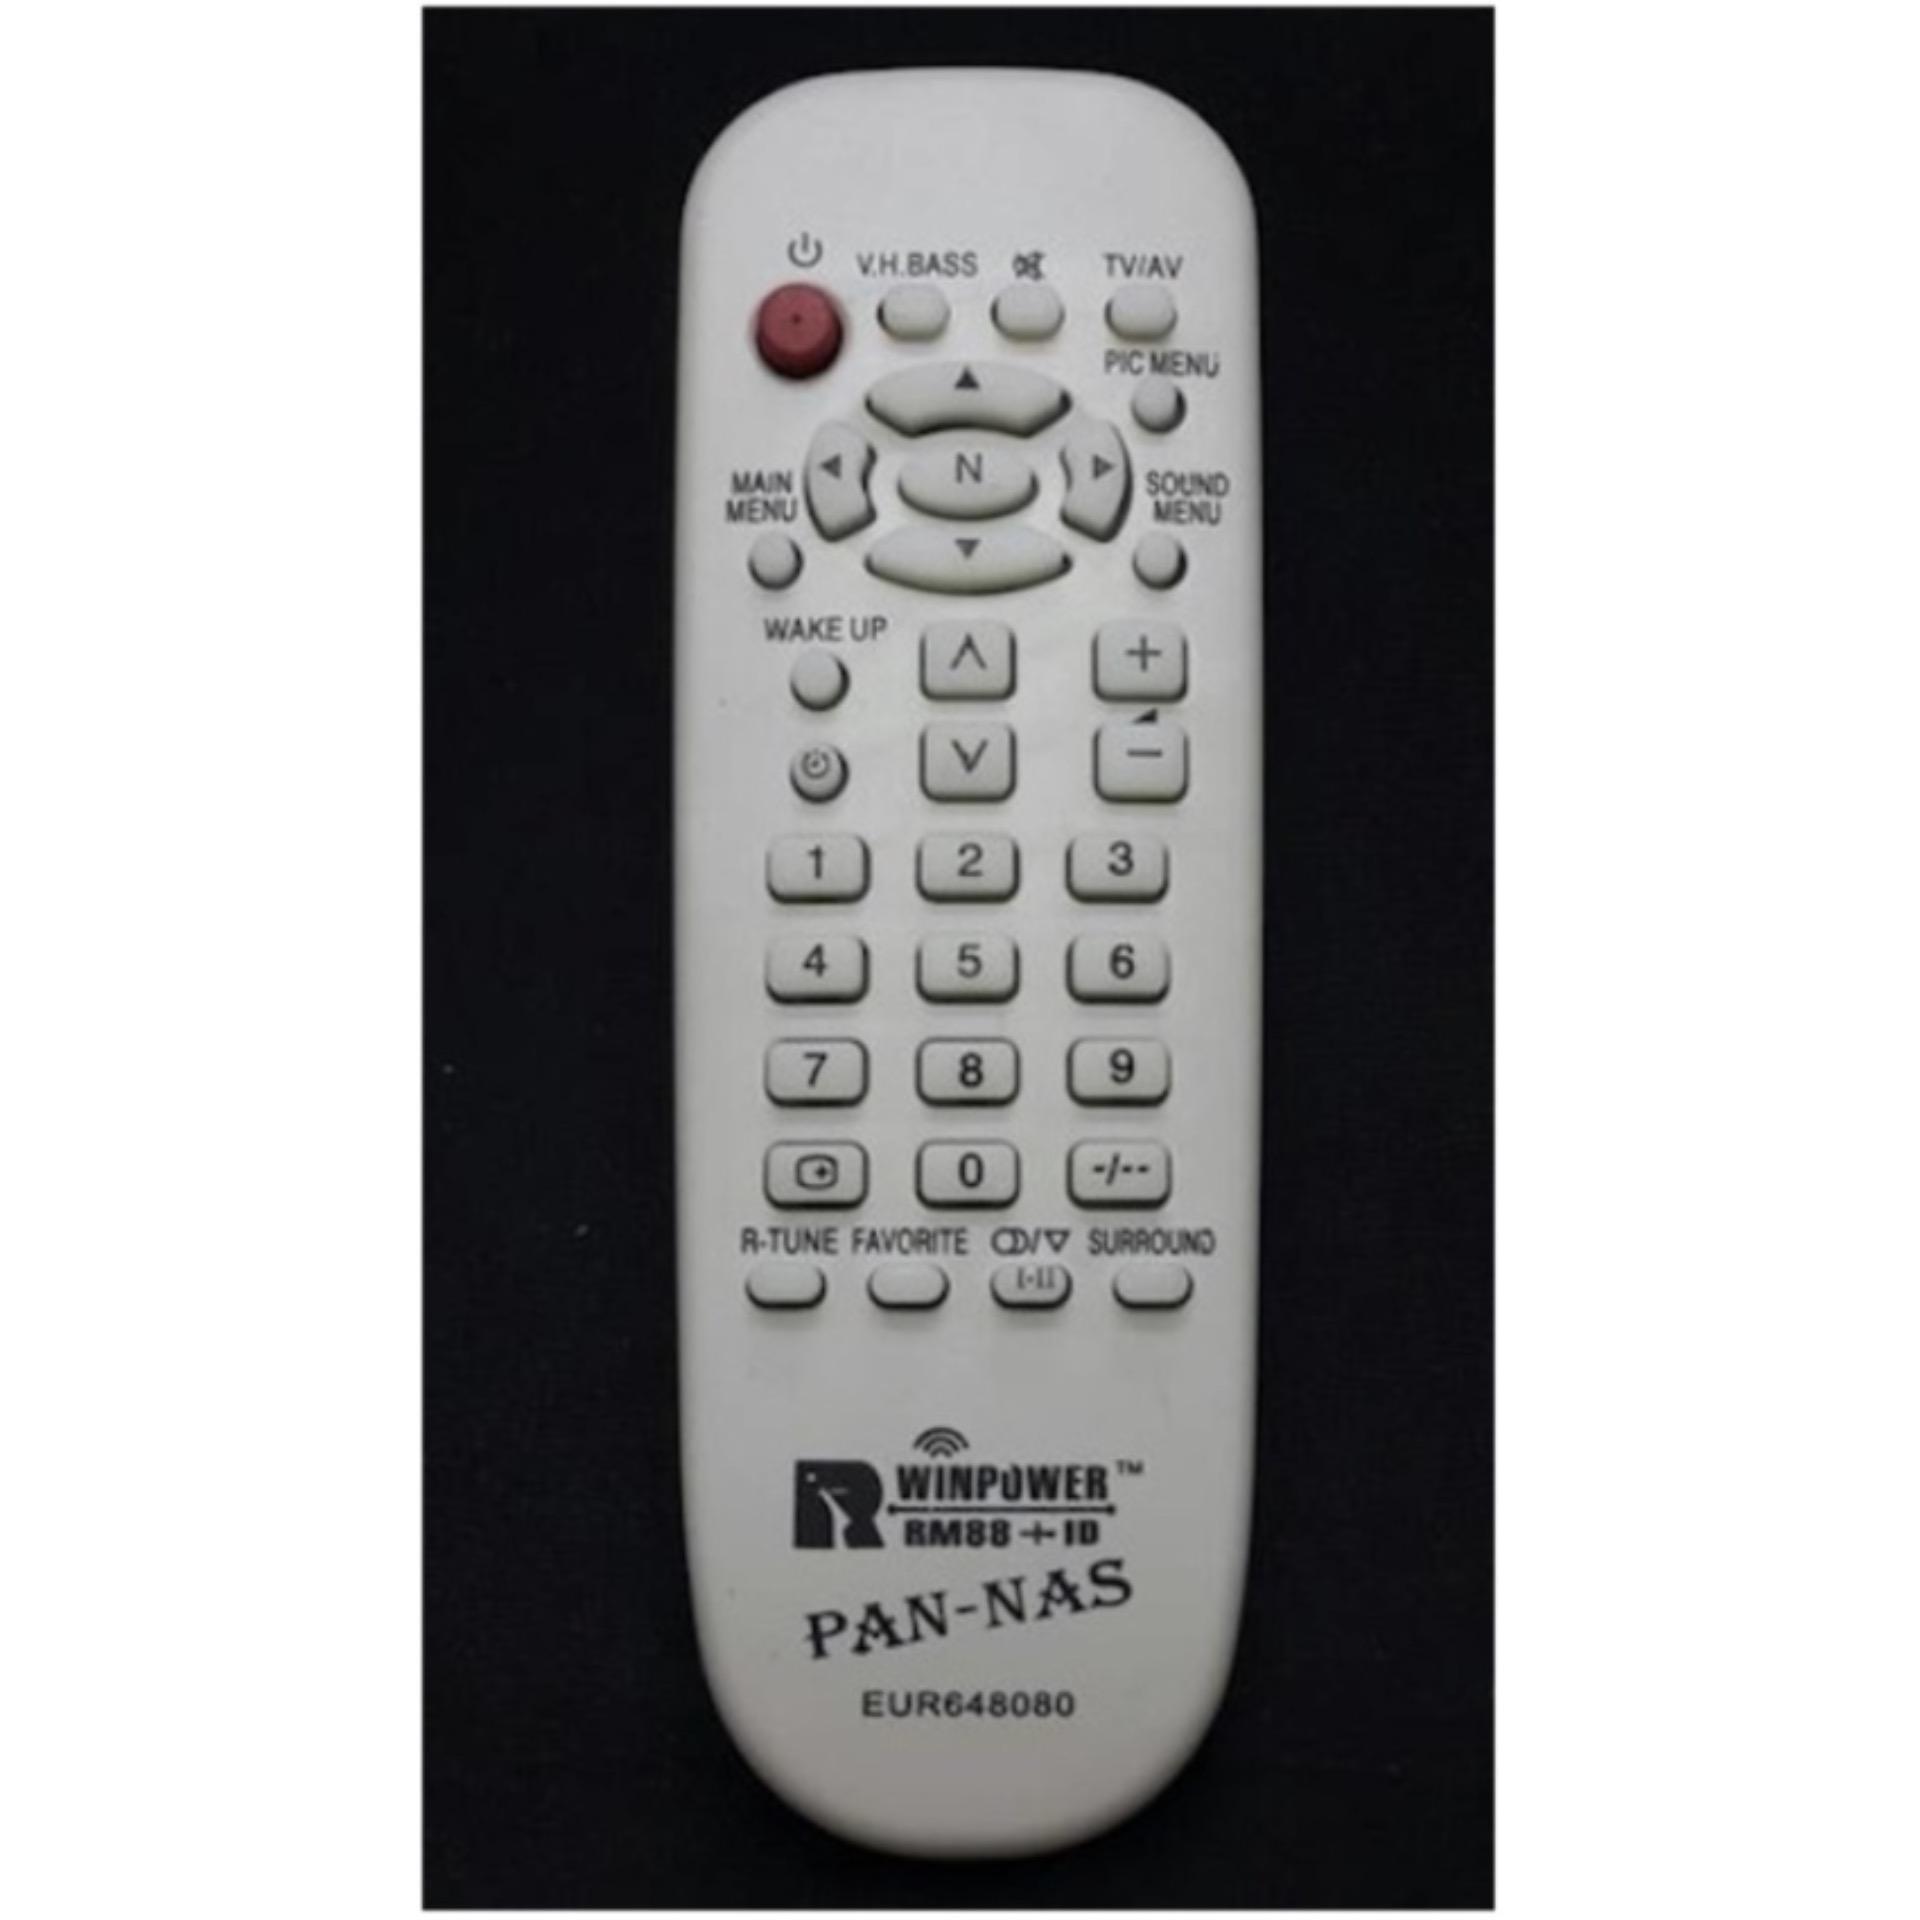 Panasonic Remote TV Tabung - Putih